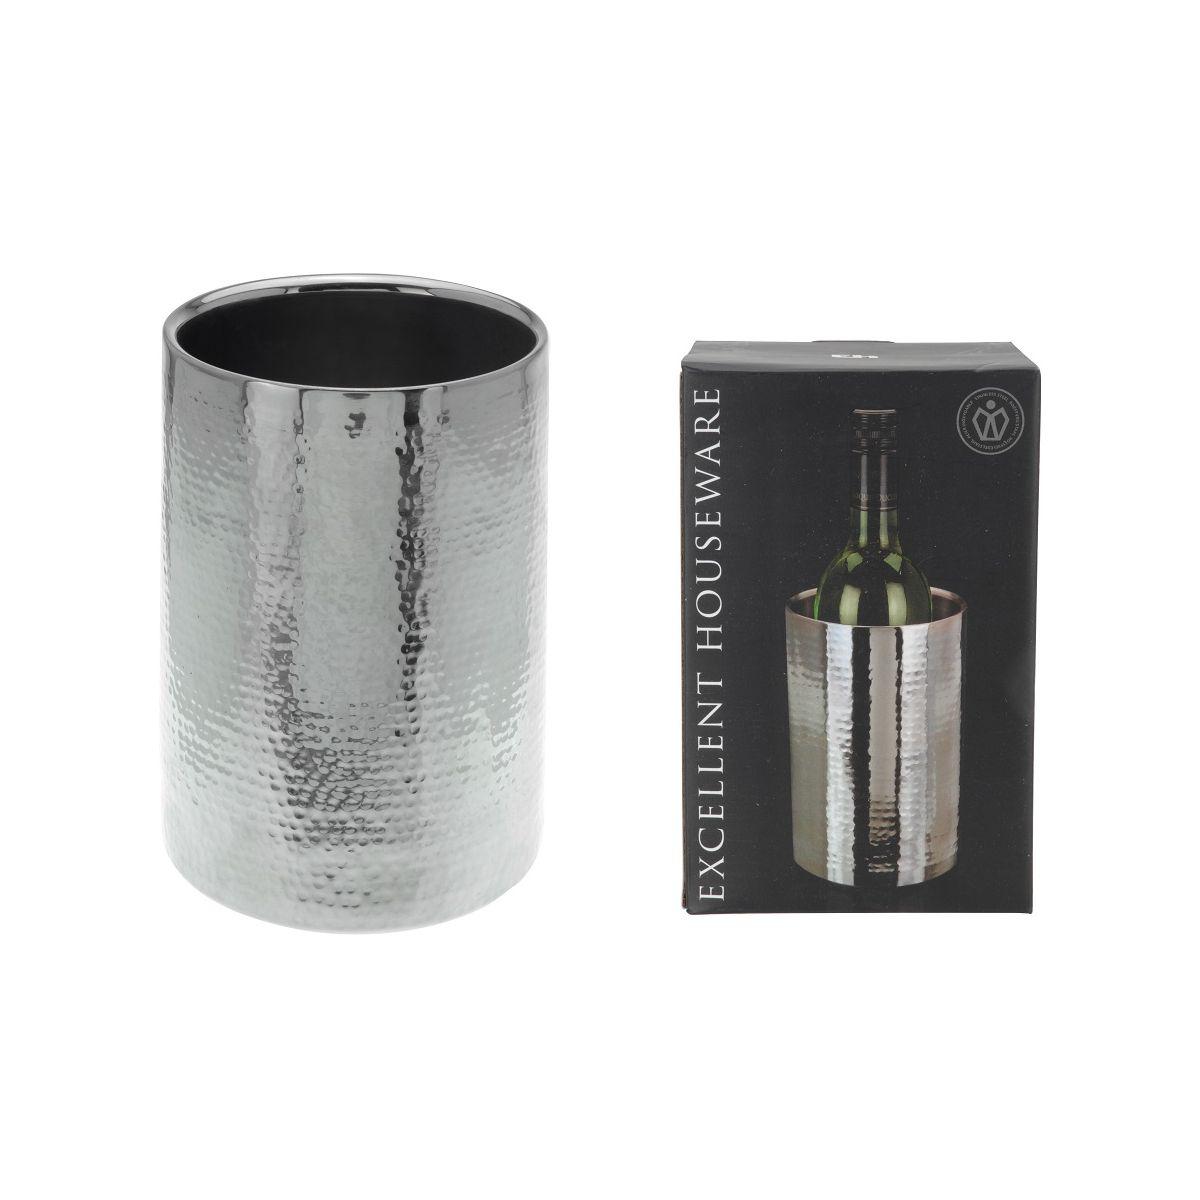 Ведерко д/вина 12*18 смведёрко для охлаждения вина, разм. 12х18 см<br>